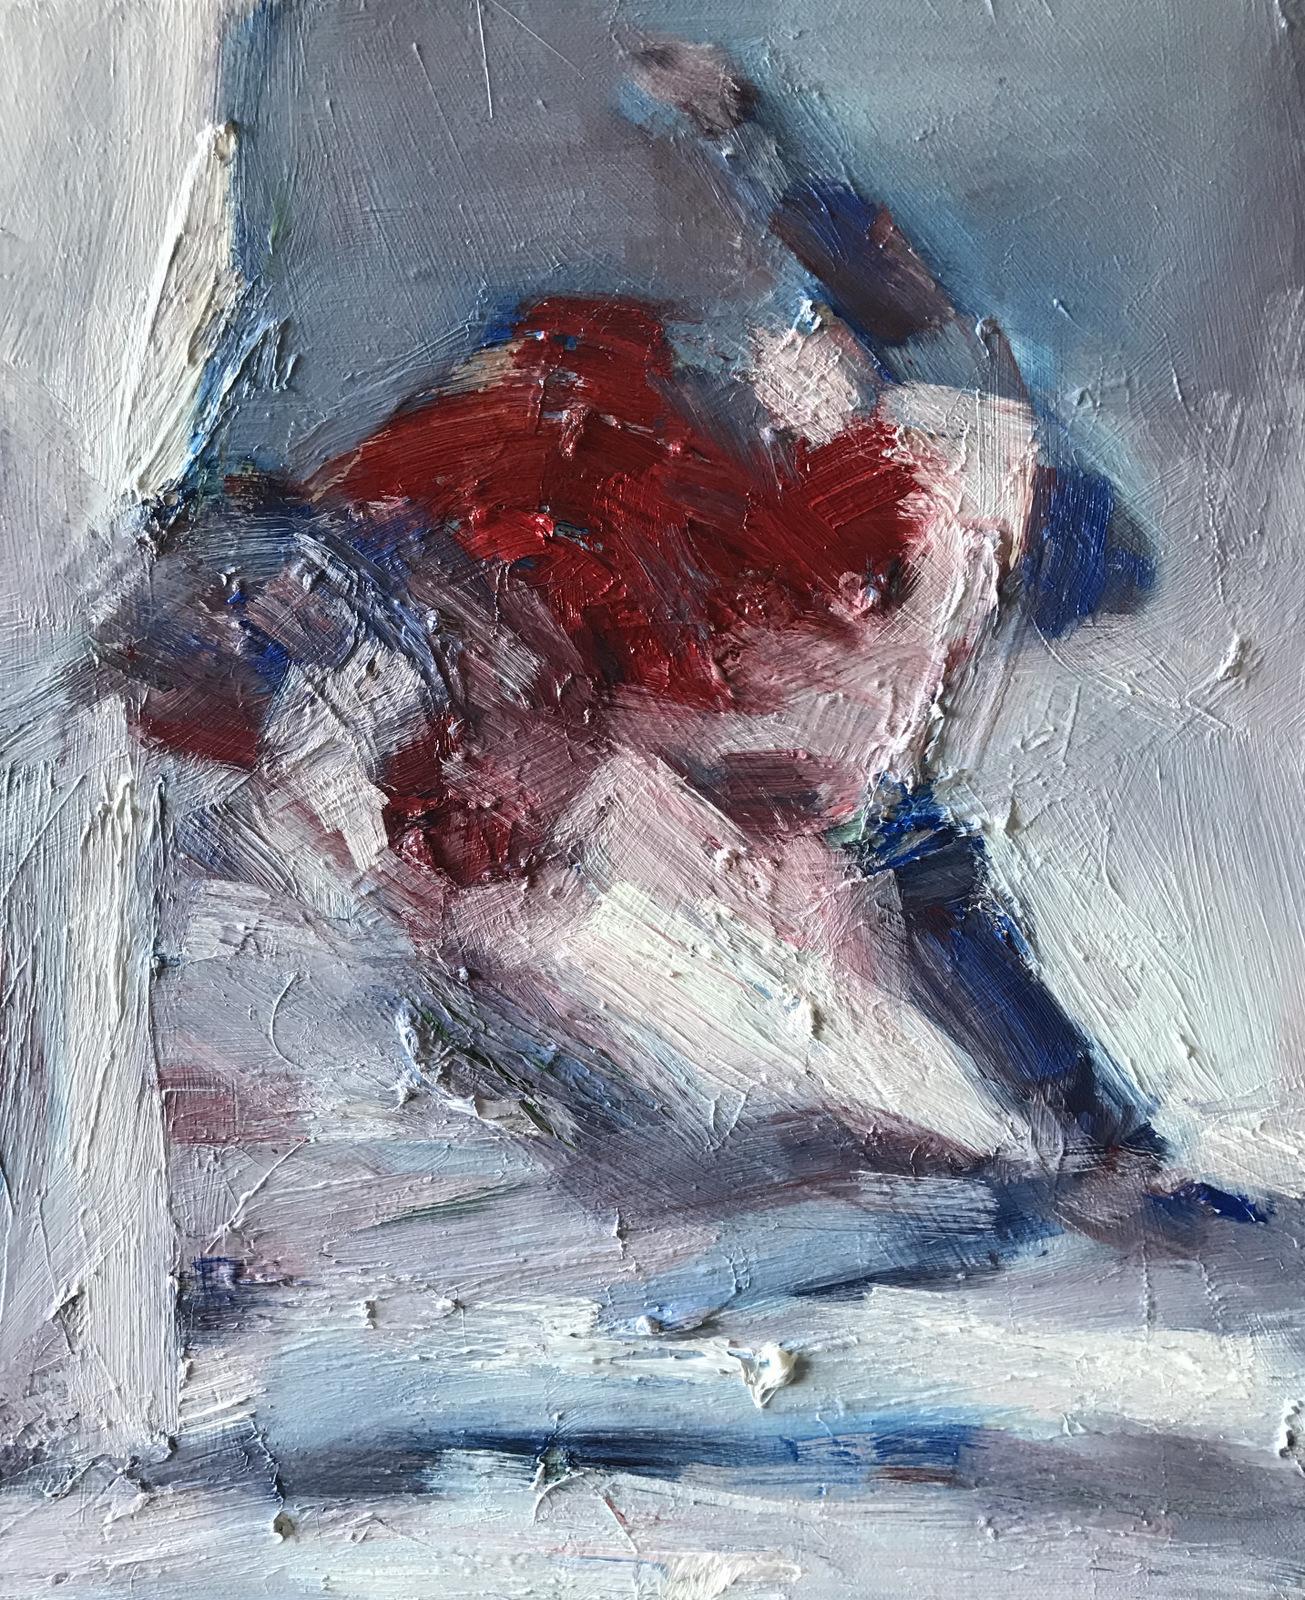 Art contemporain, sensualisme, peinture à l'huile, Oil Painting, Contemporary painting, #contemporaryart